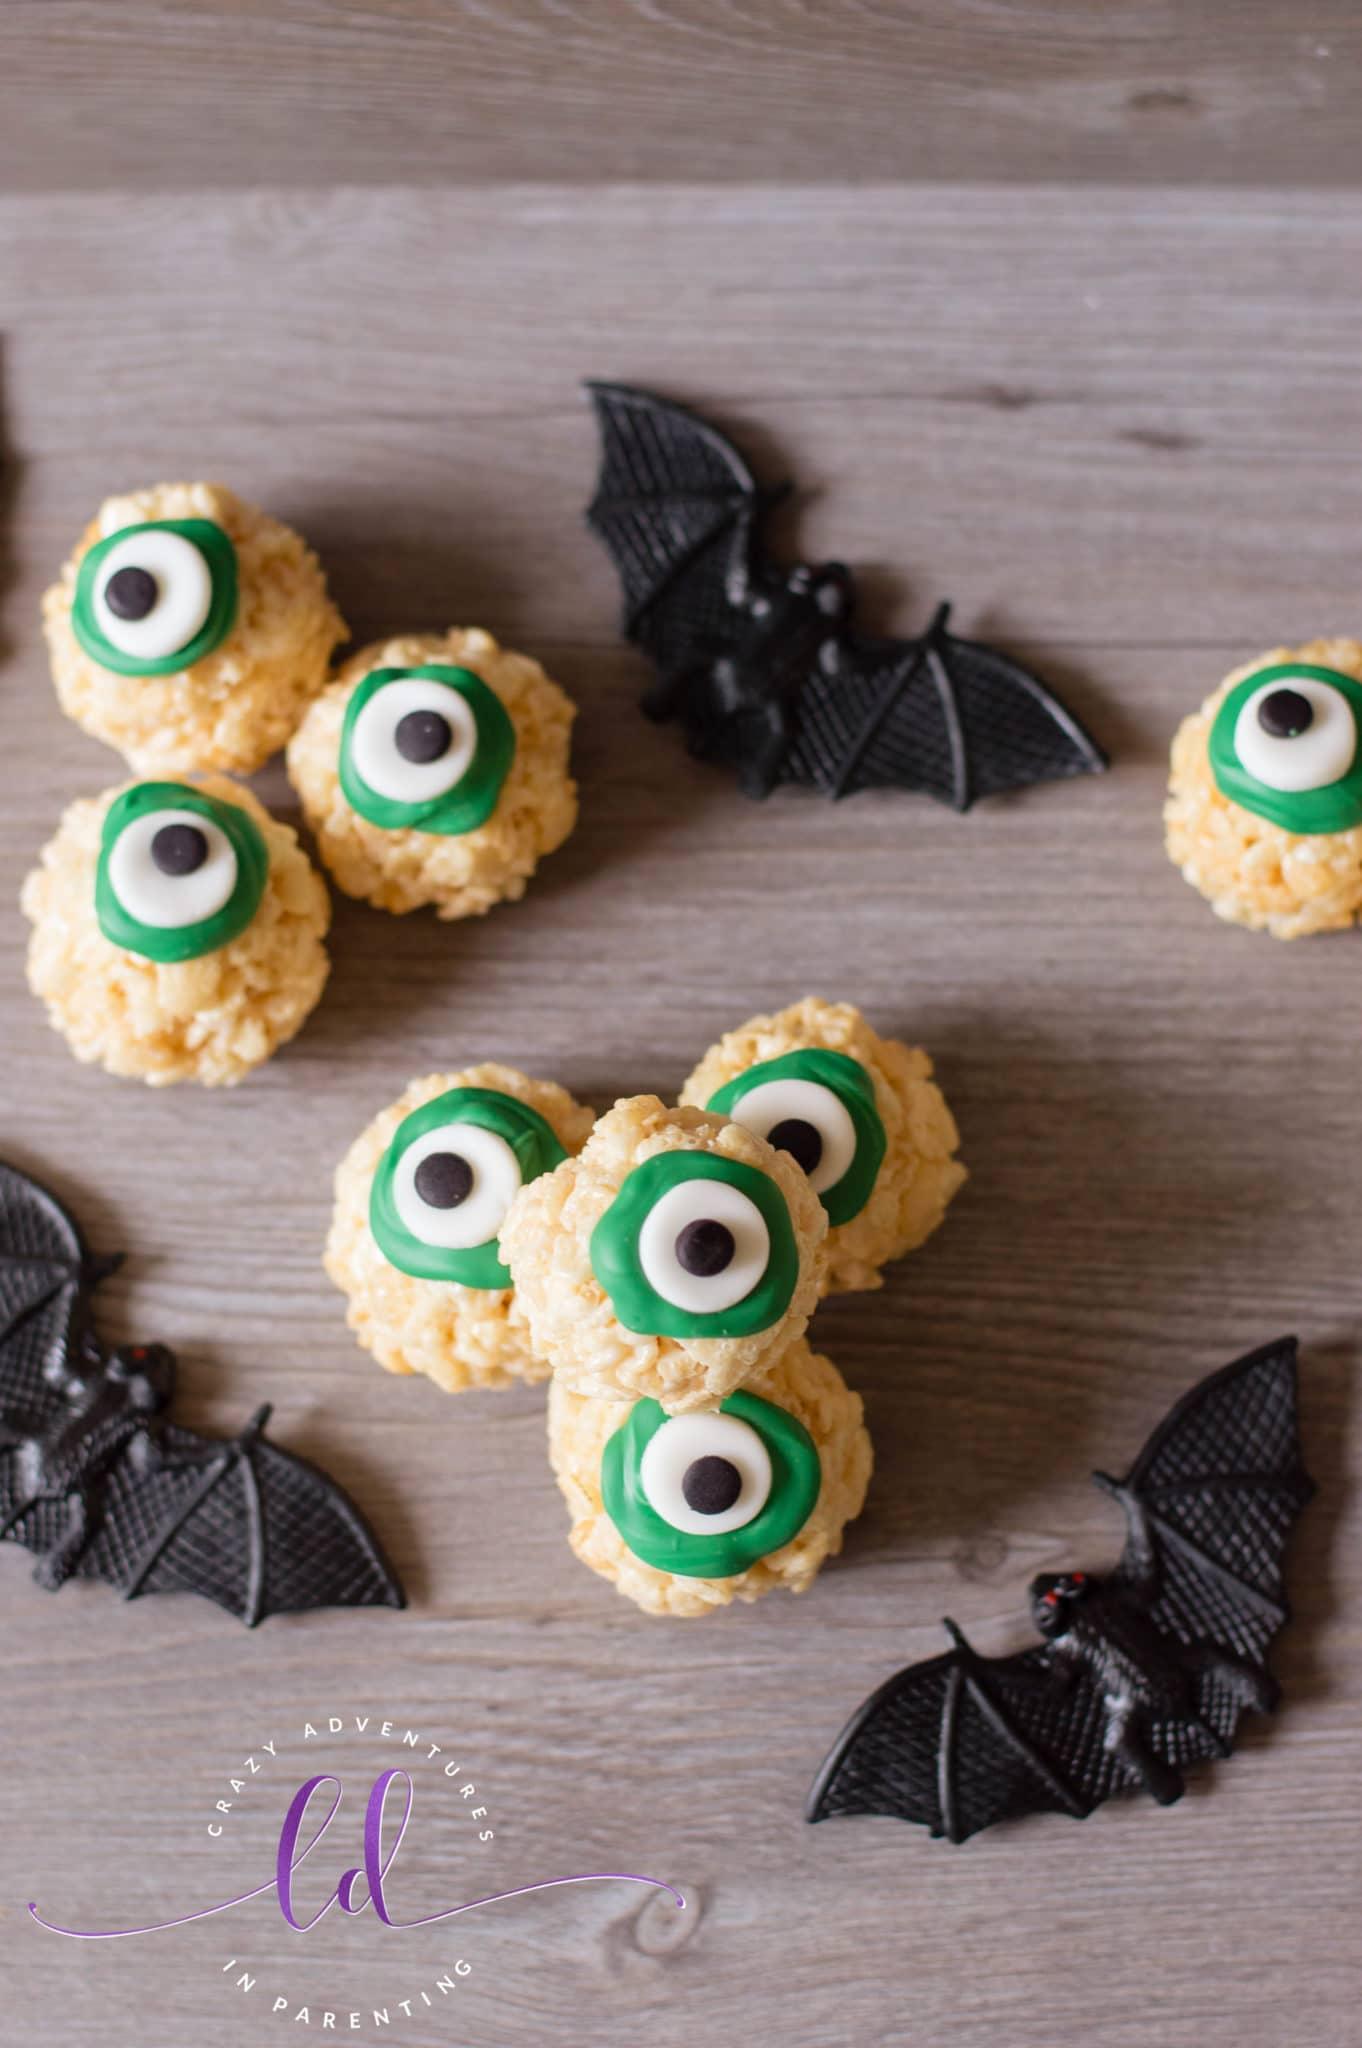 Not So Spooky Halloween Eyeballs Rice Krispies Treats